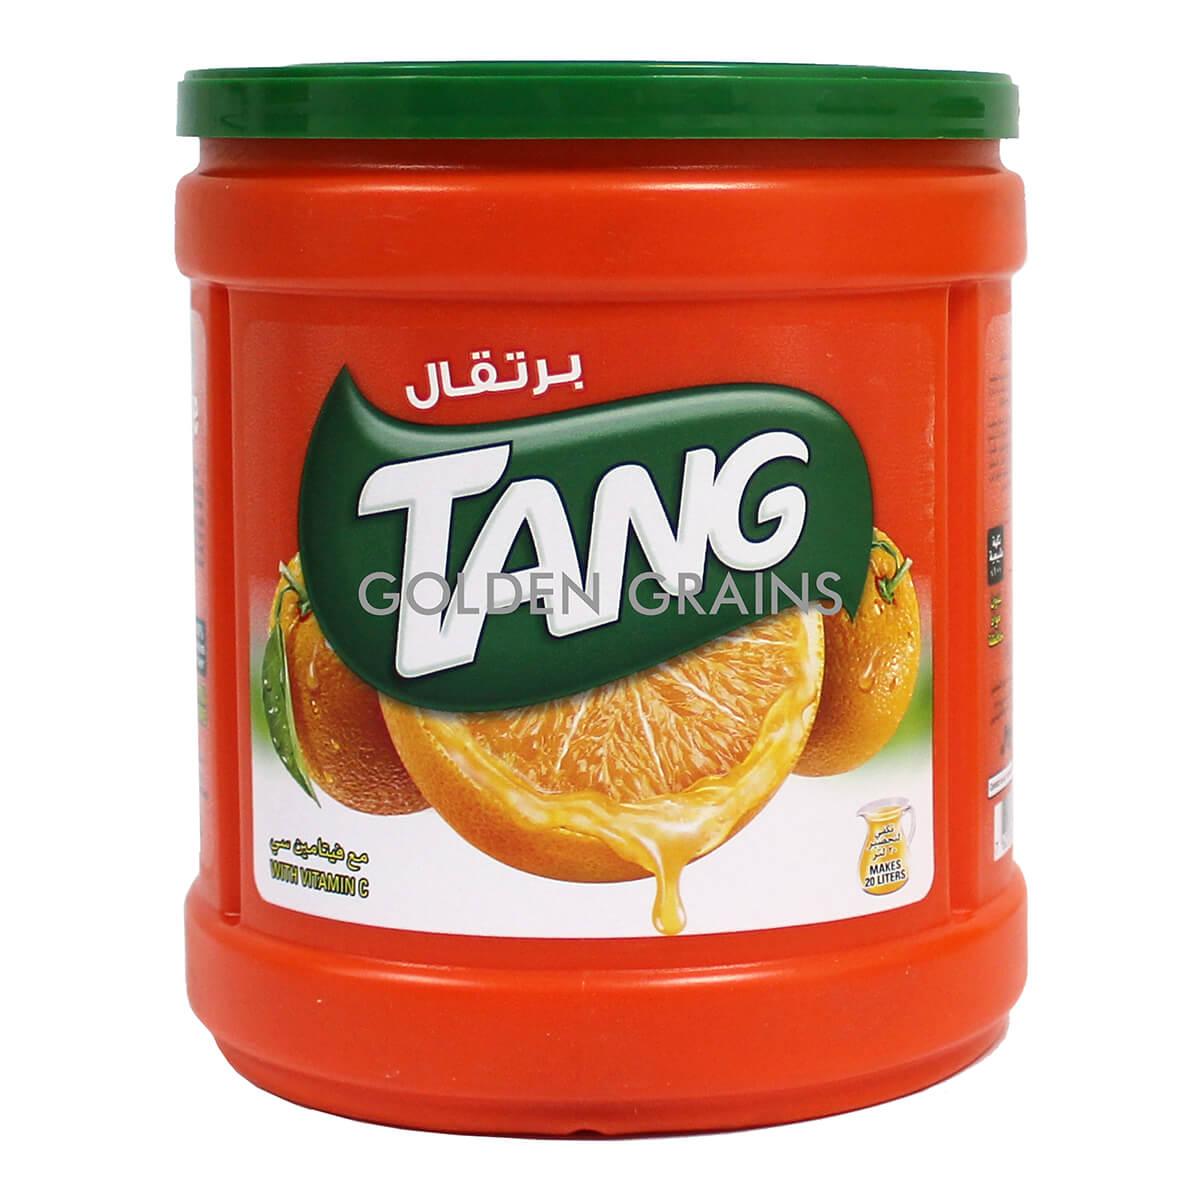 Golden Grains Dubai Export - Tang Orange - Front.jpg